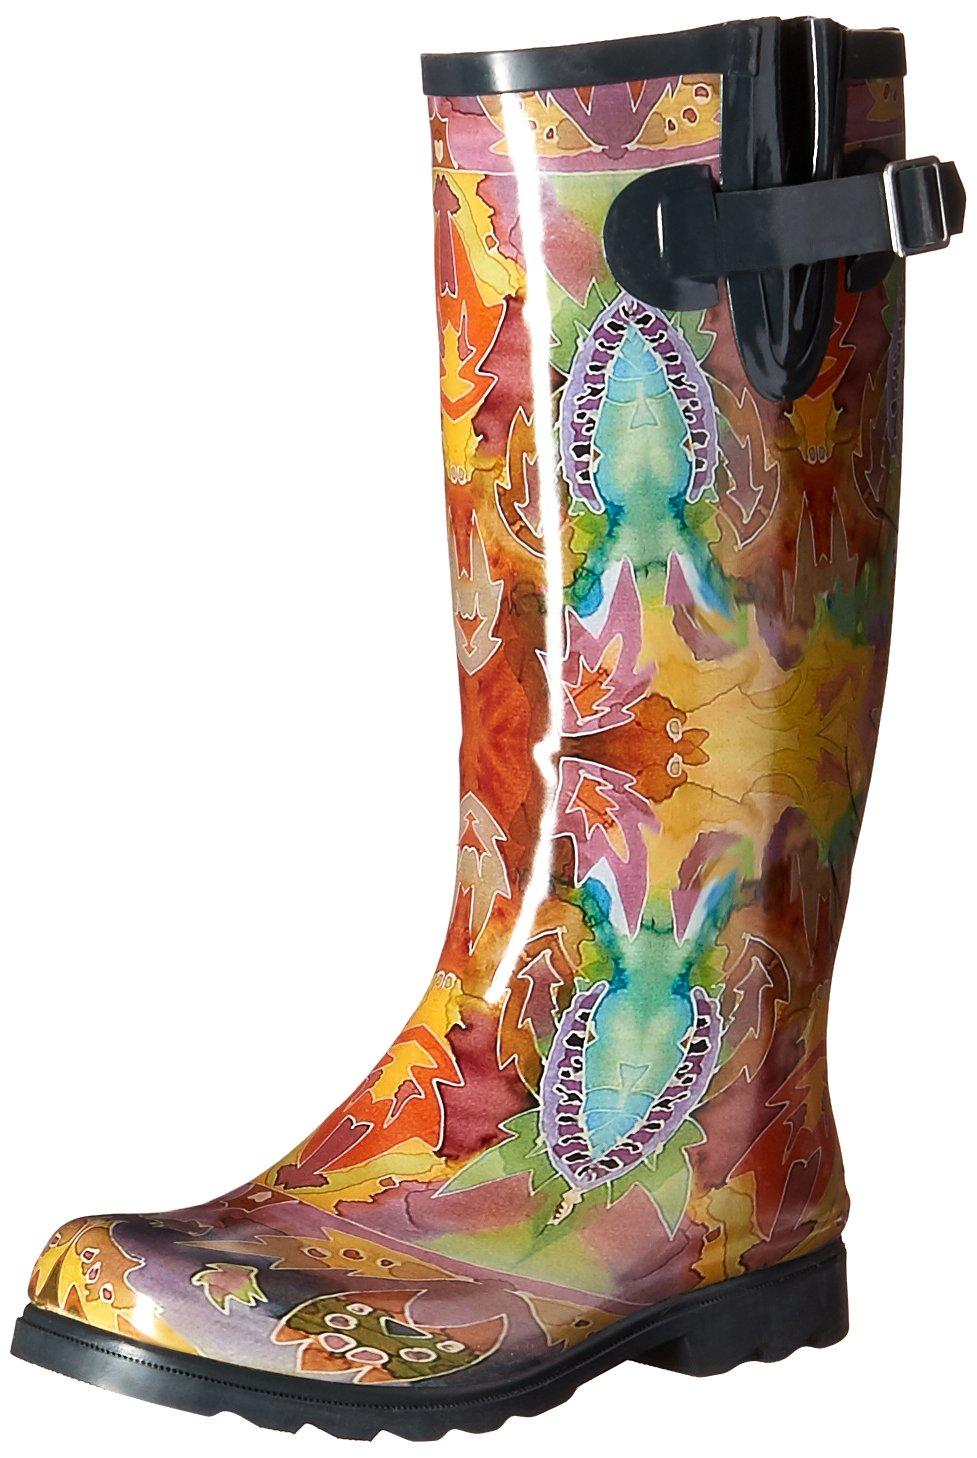 Nomad Women's Puddles III Rain Shoe B015CXLAV2 8 B(M) US|Indian Autumn